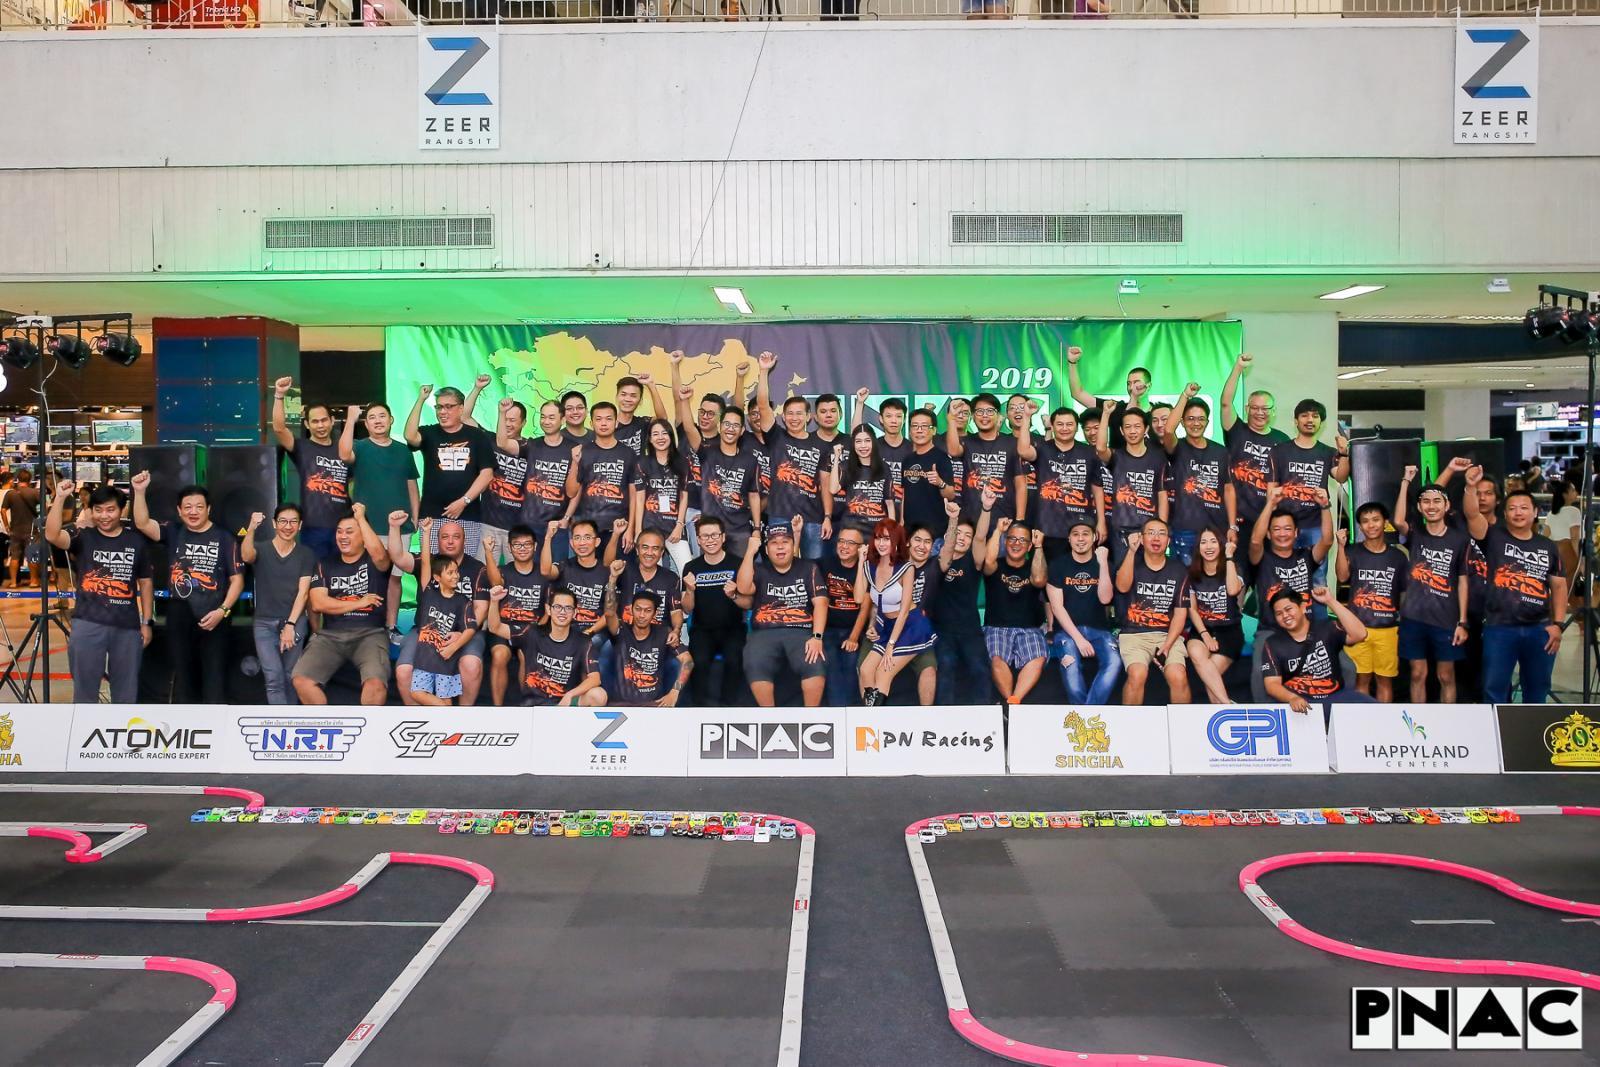 MITC งานแข่งรถบังคับวิทยุสเกลเล็ก (MiniZ) 5-8 พ.ย. 63 ทีเซียร์รังสิต